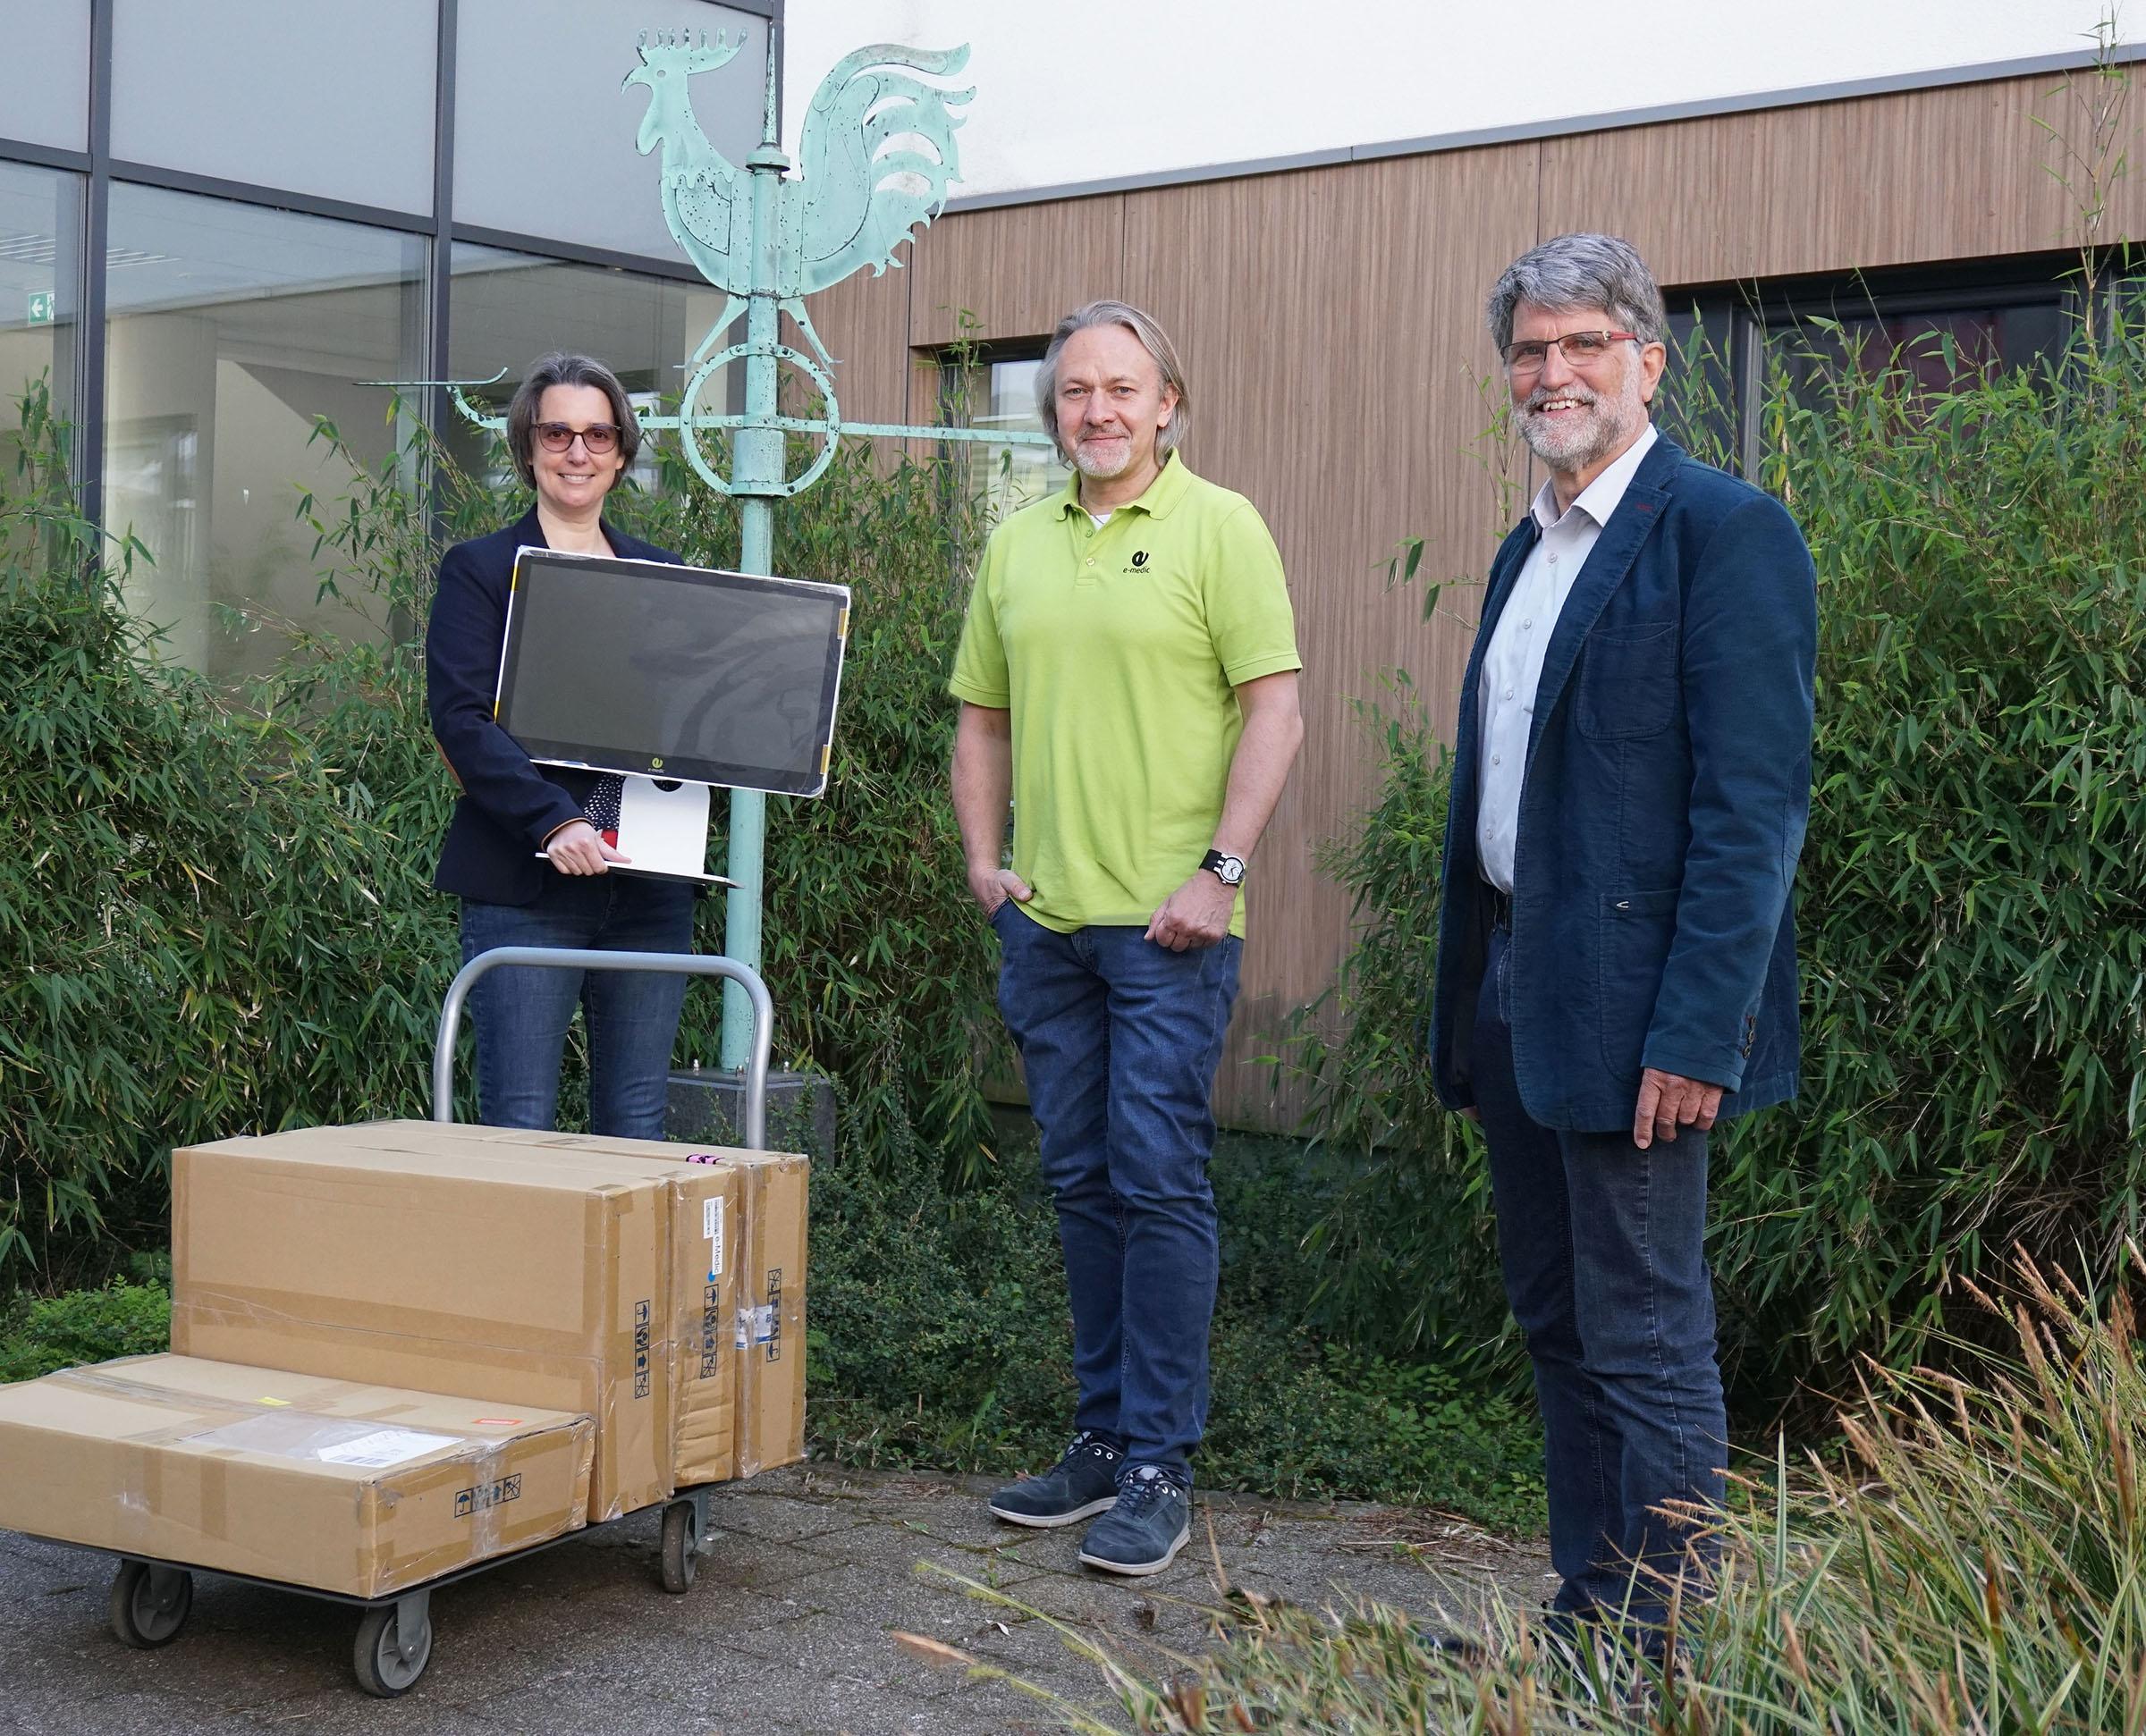 Baaske-Medical-Pressefoto-bergabe-PC-Stadtschule-L-bbecke-Anke-Schrader-Andreas-Baaske-Michael-Hafner